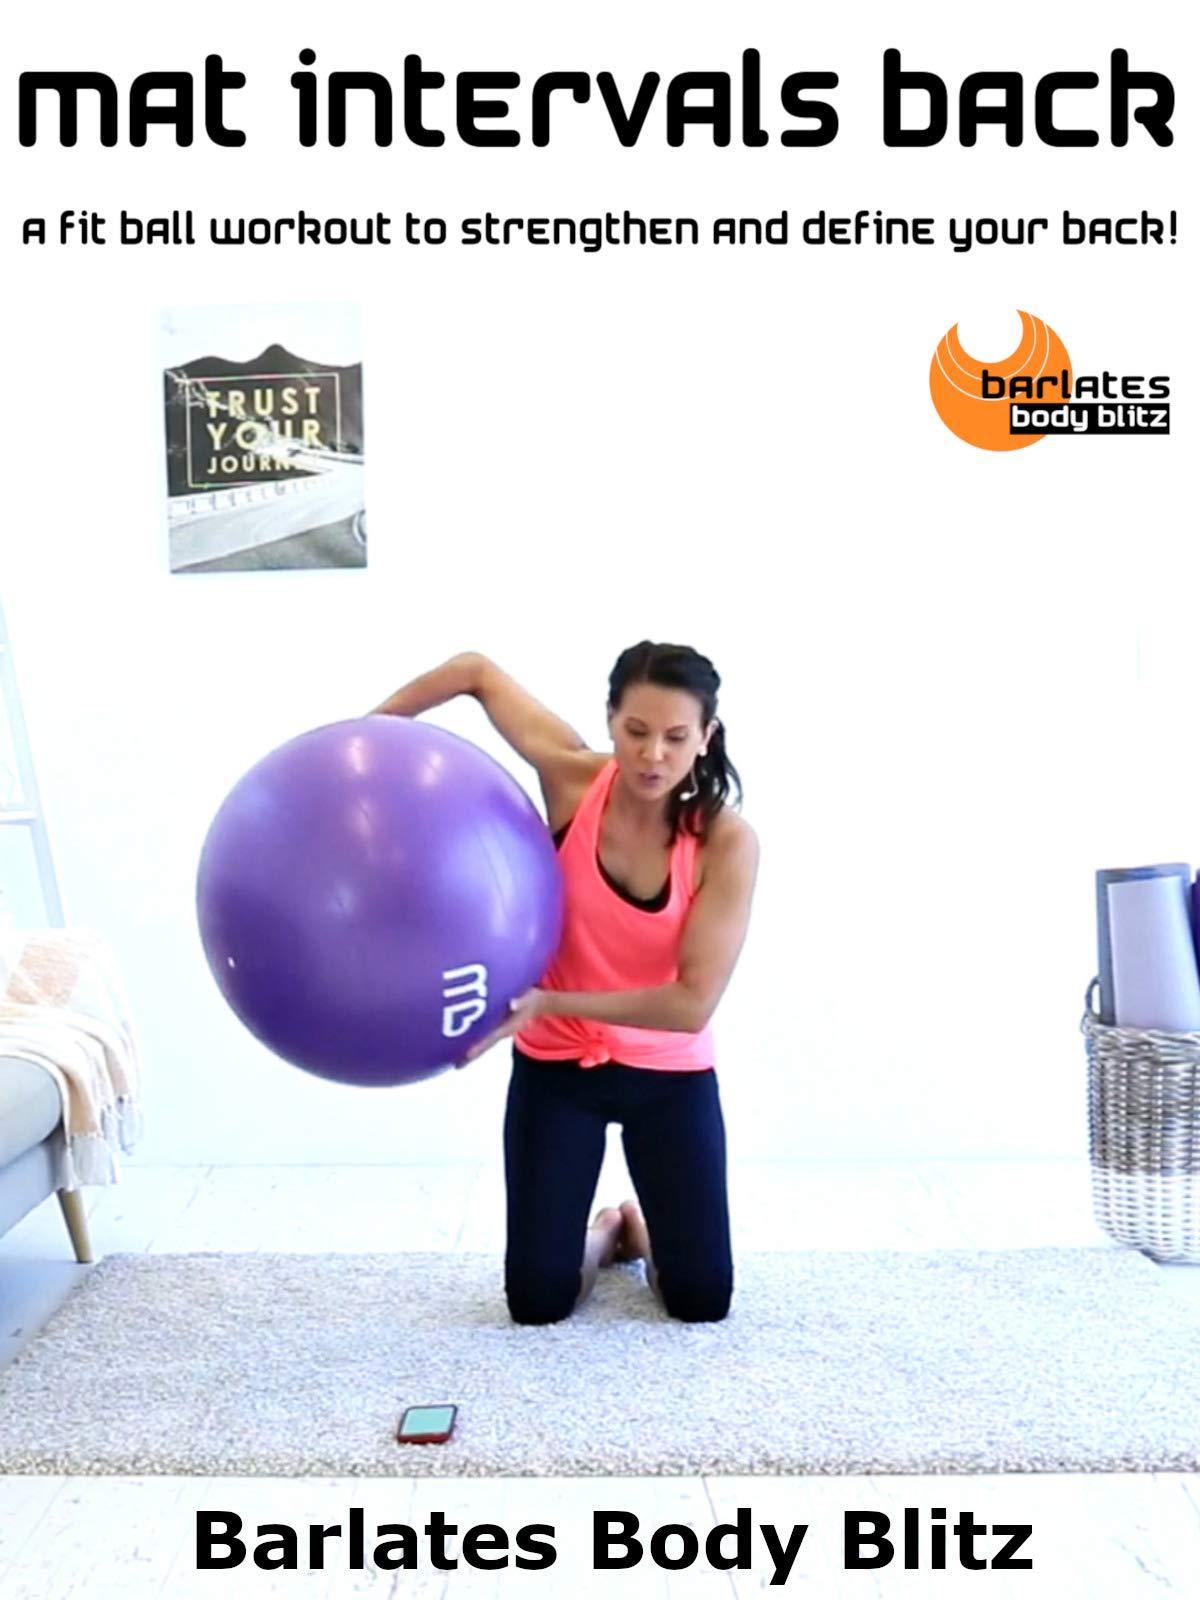 Barlates Body Blitz Mat Intervals Back